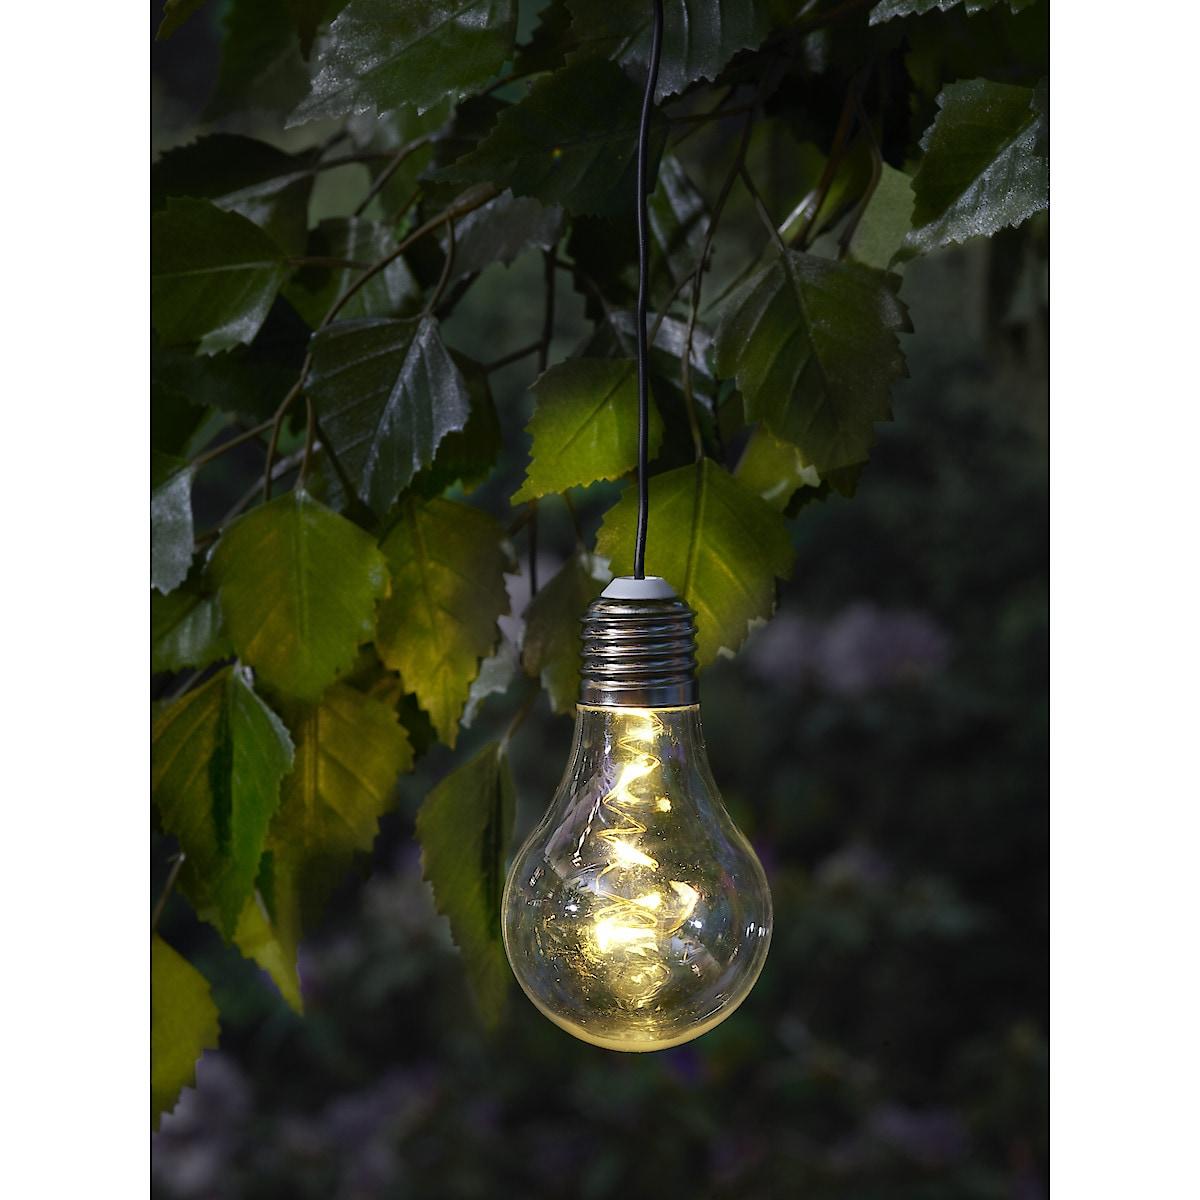 Hengende lampe med solceller